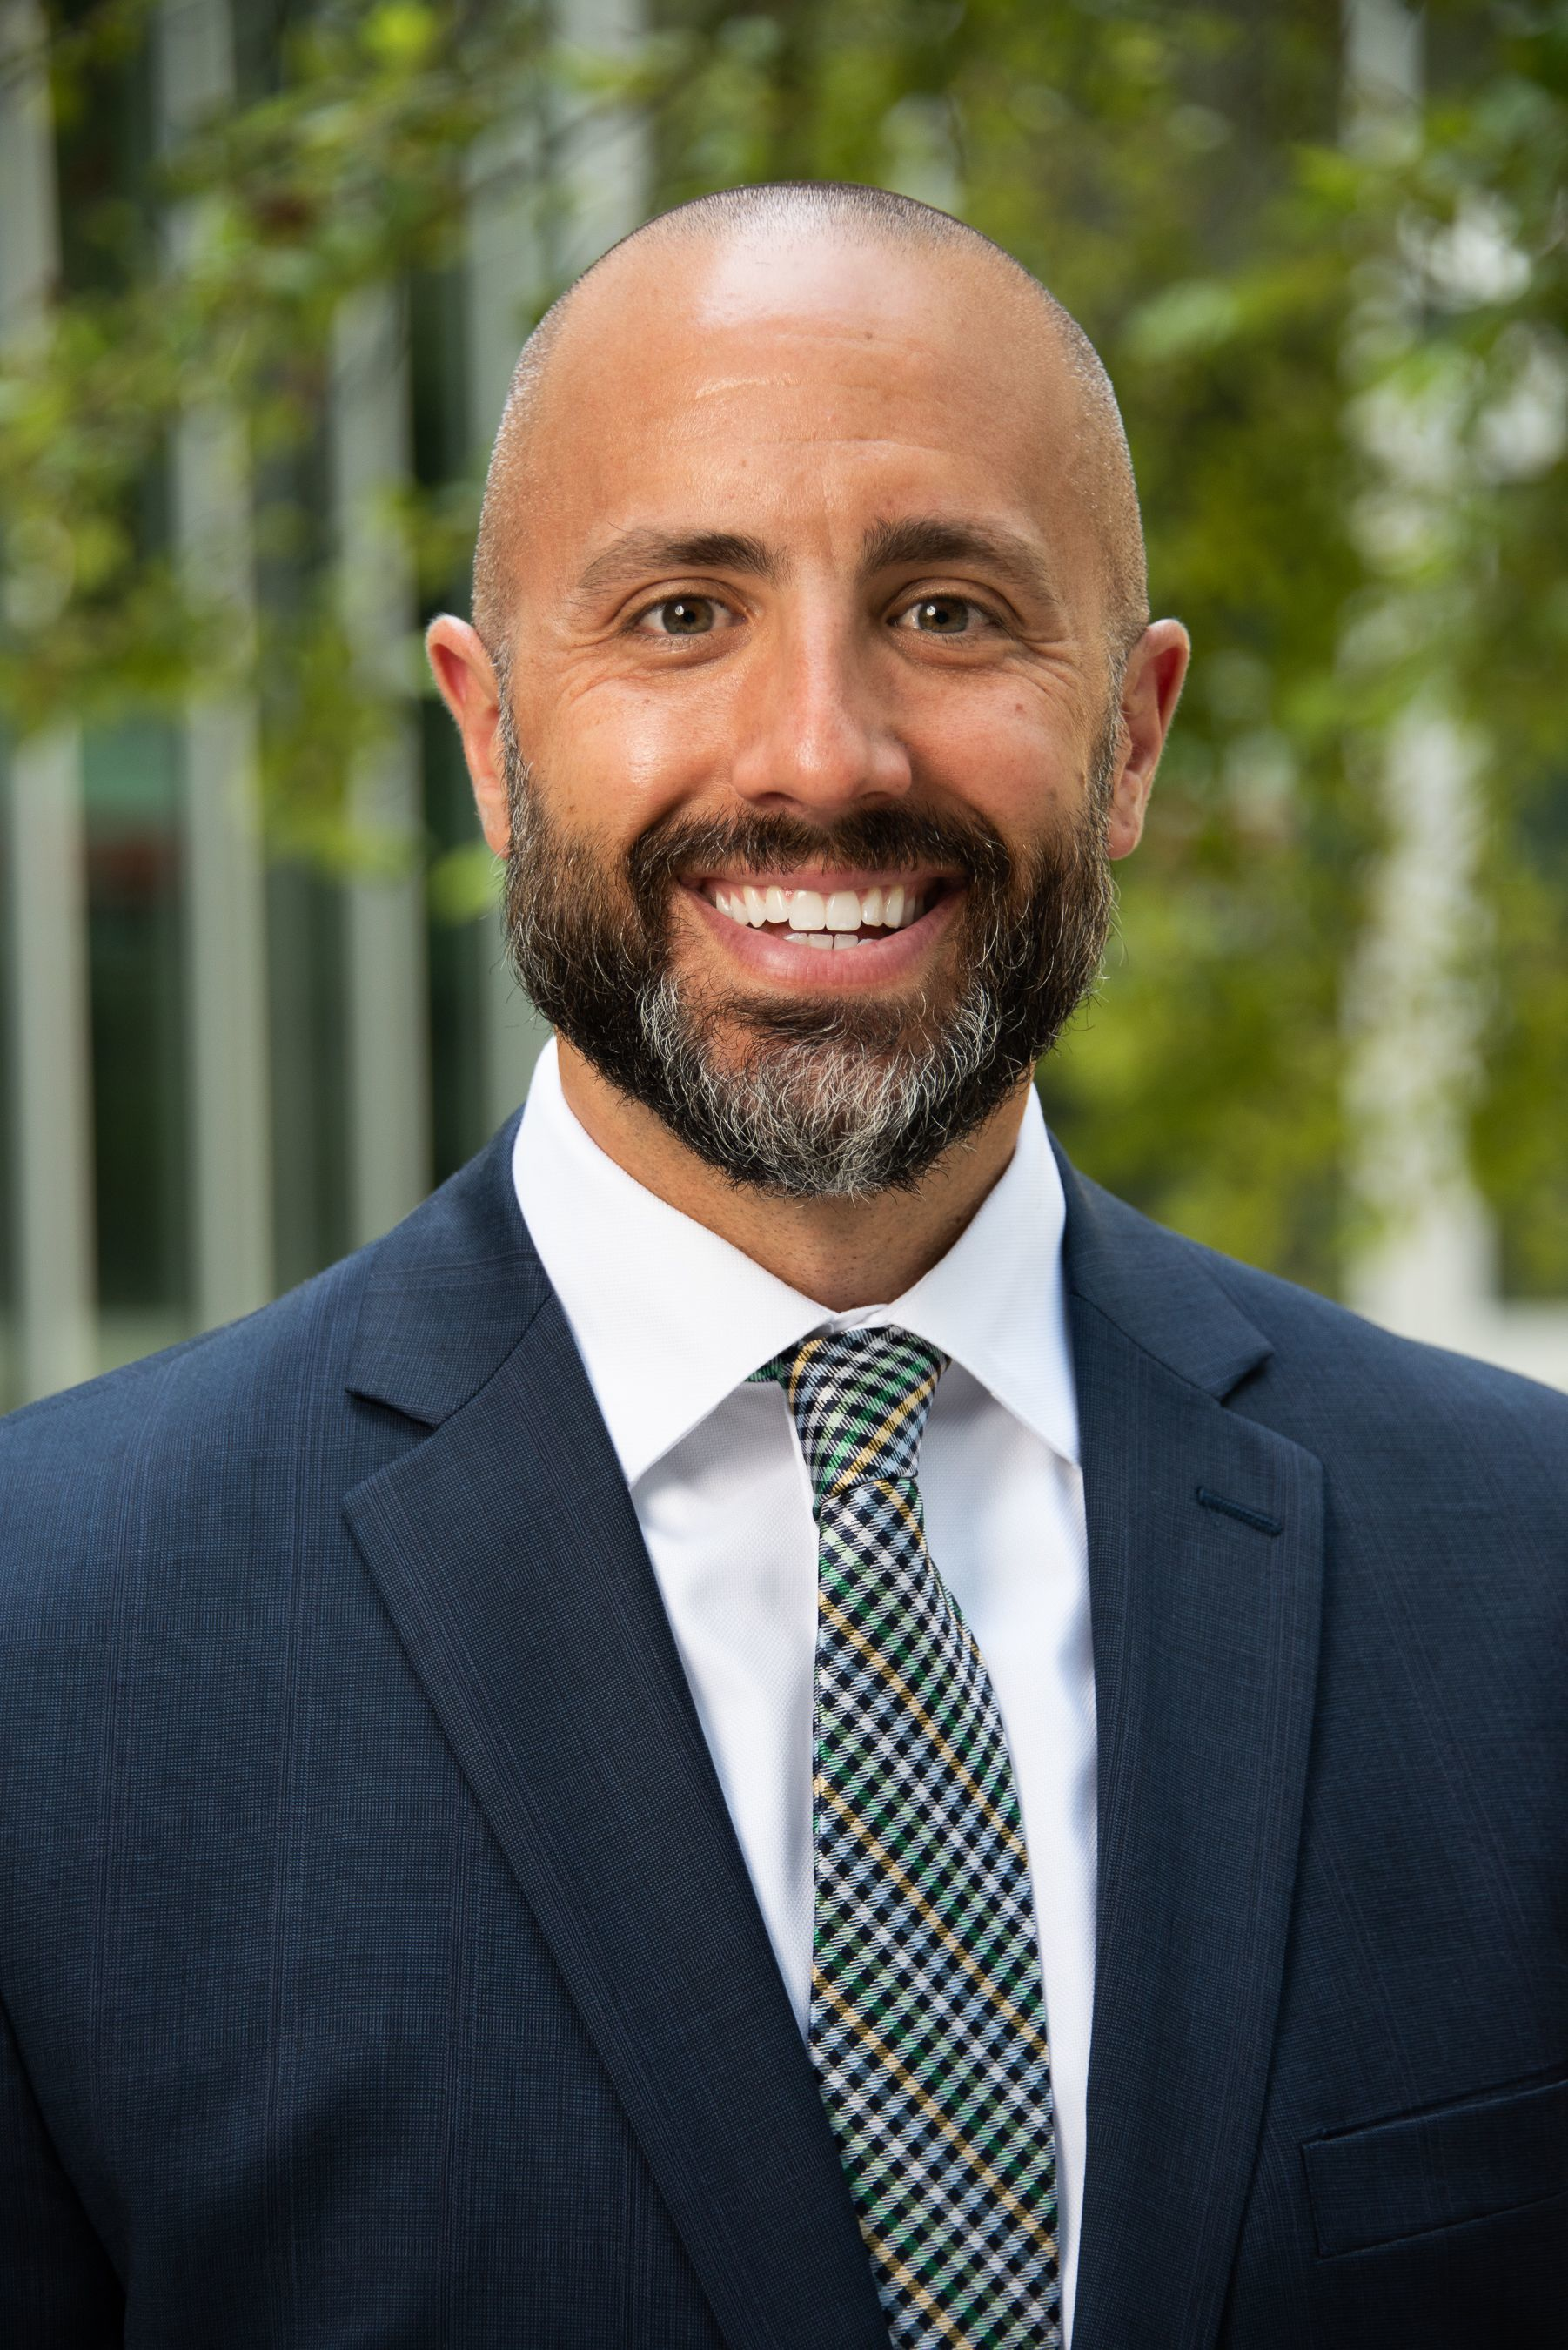 Philip Zeccardi